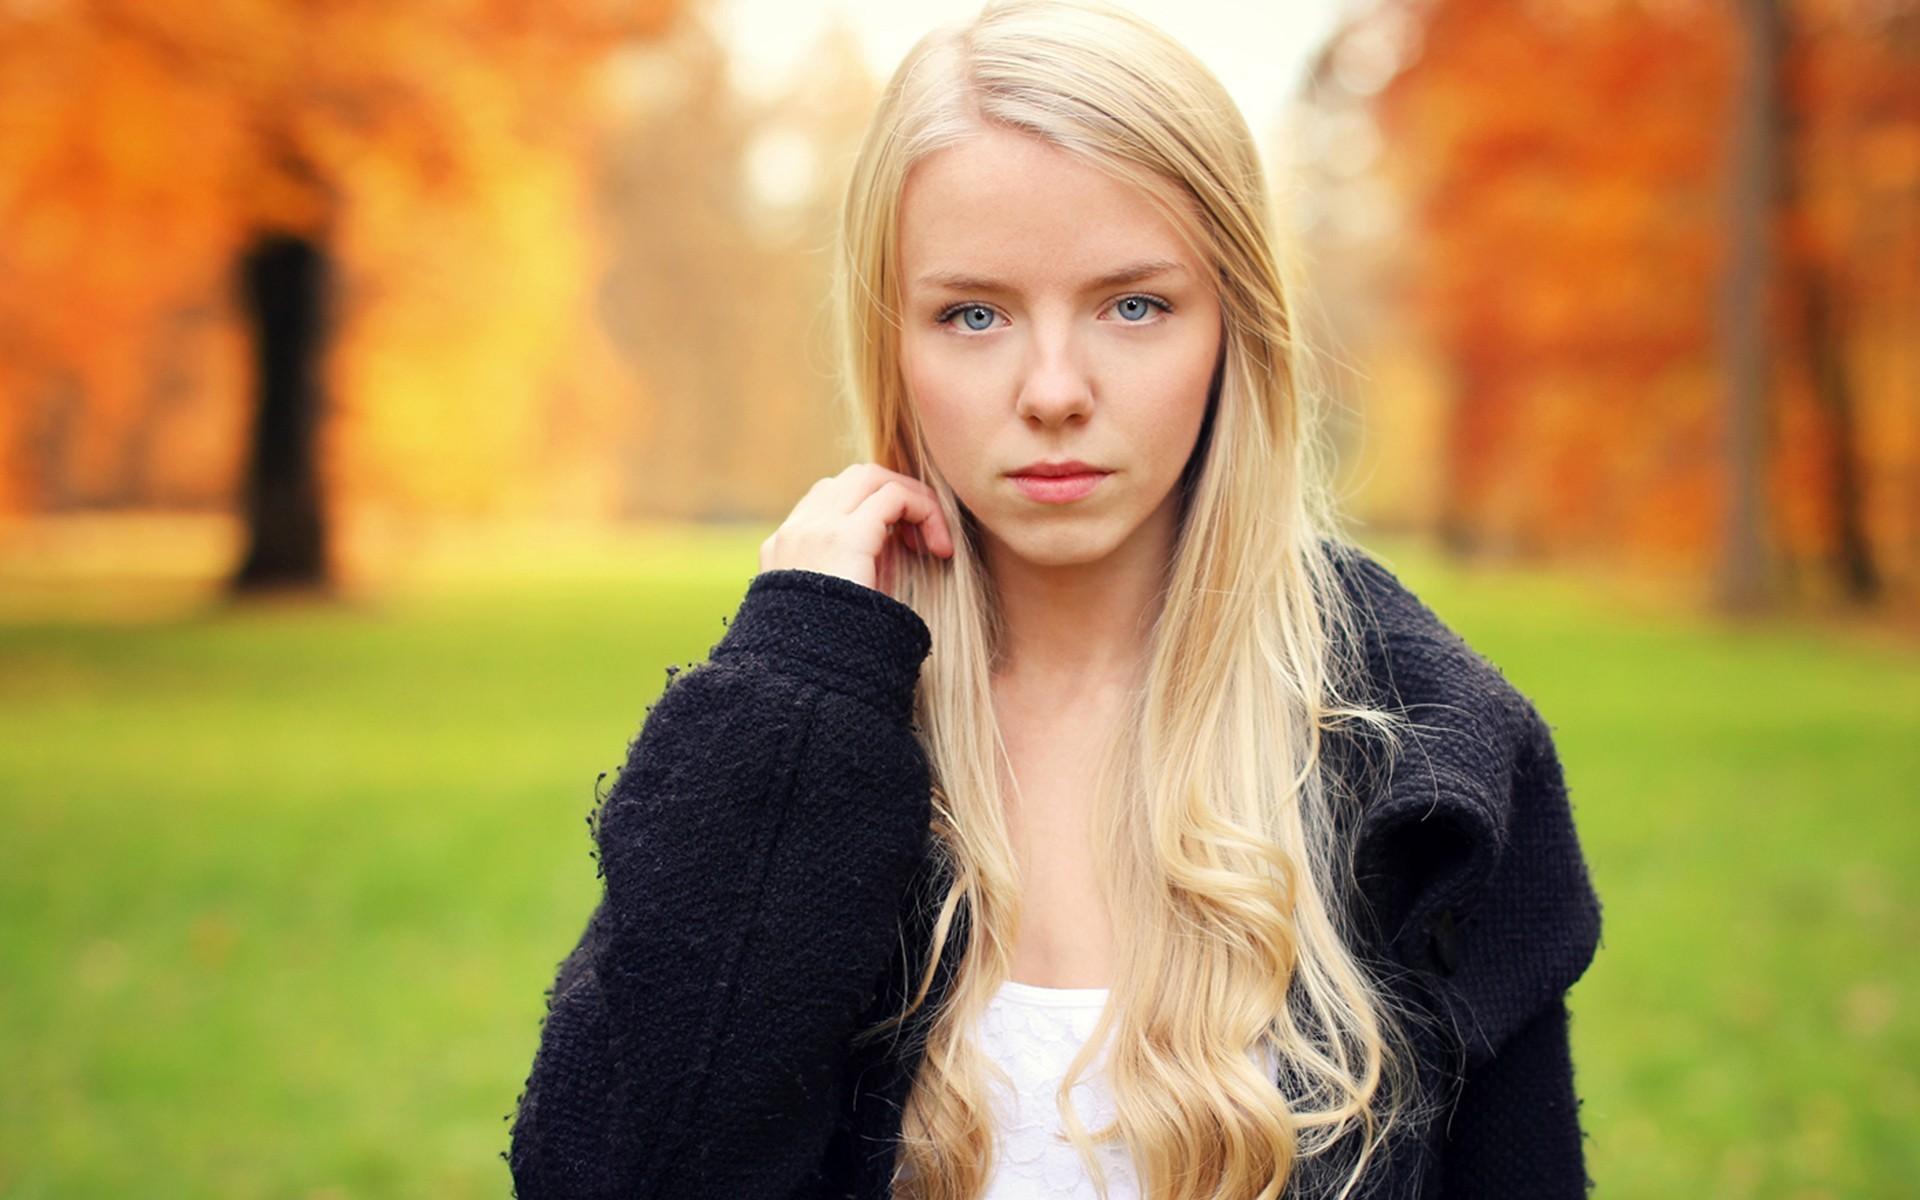 Pretty blonde girl